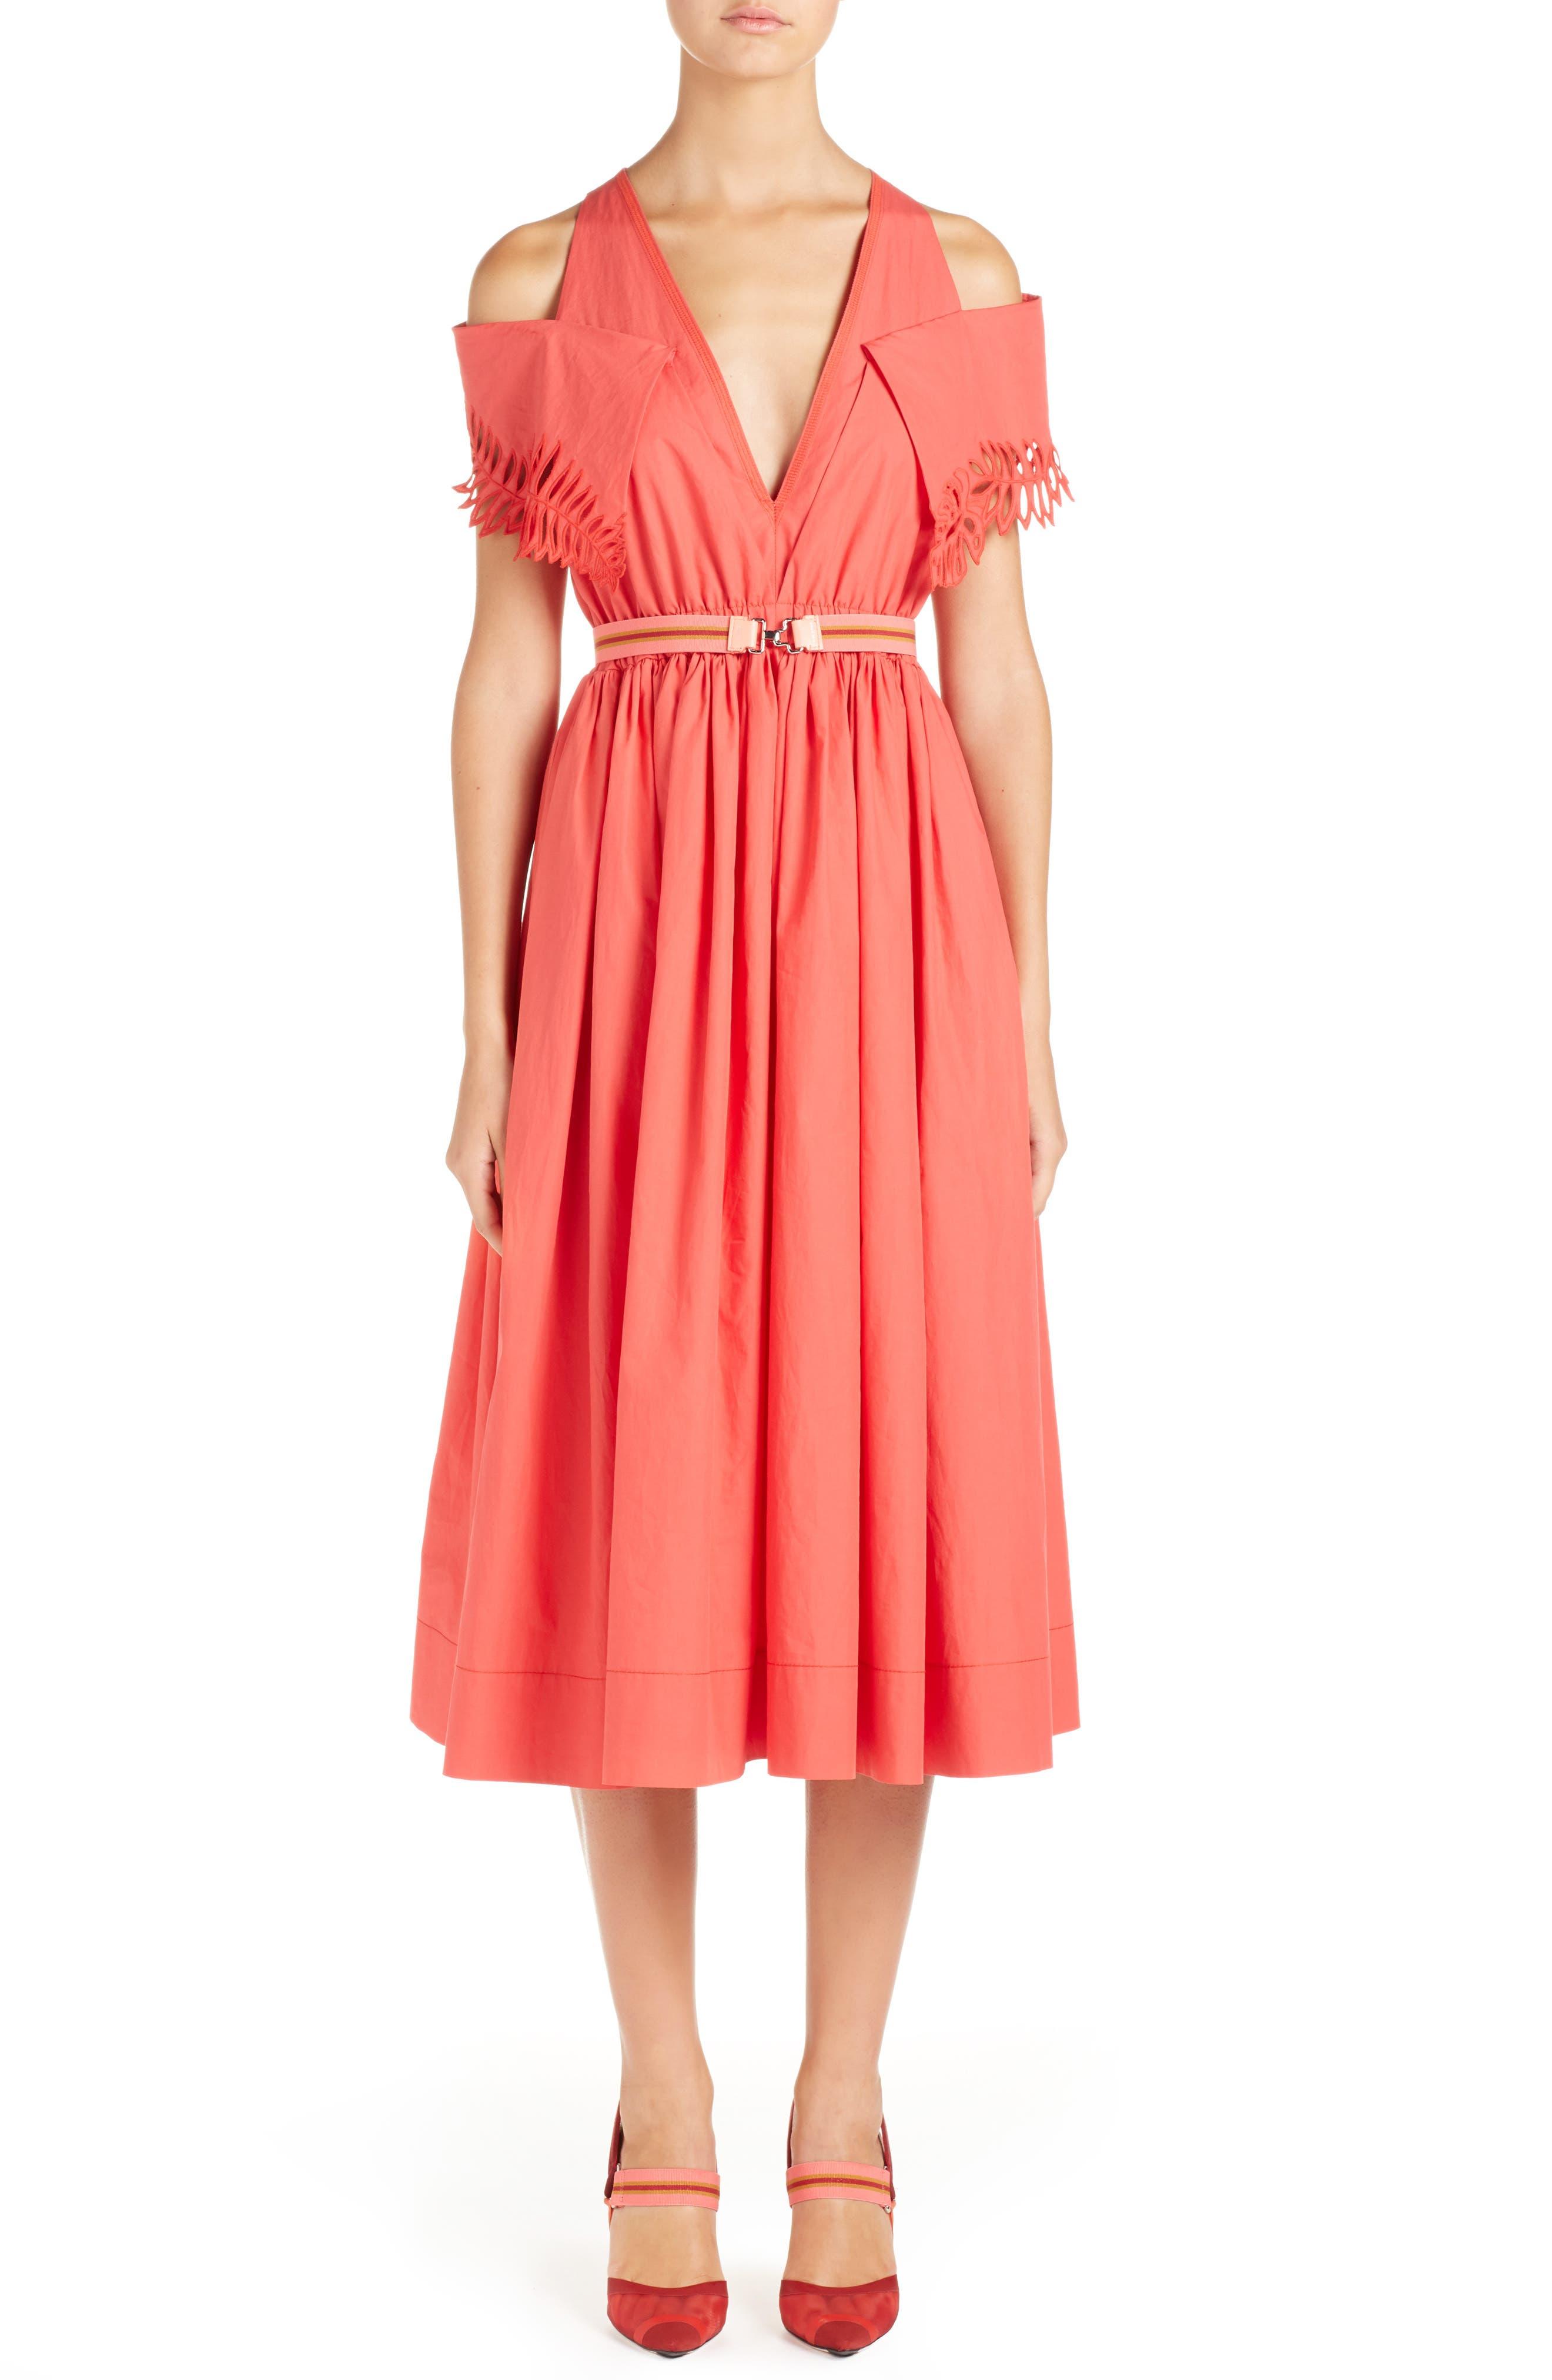 Alternate Image 1 Selected - Fendi Cold Shoulder Taffeta Midi Dress